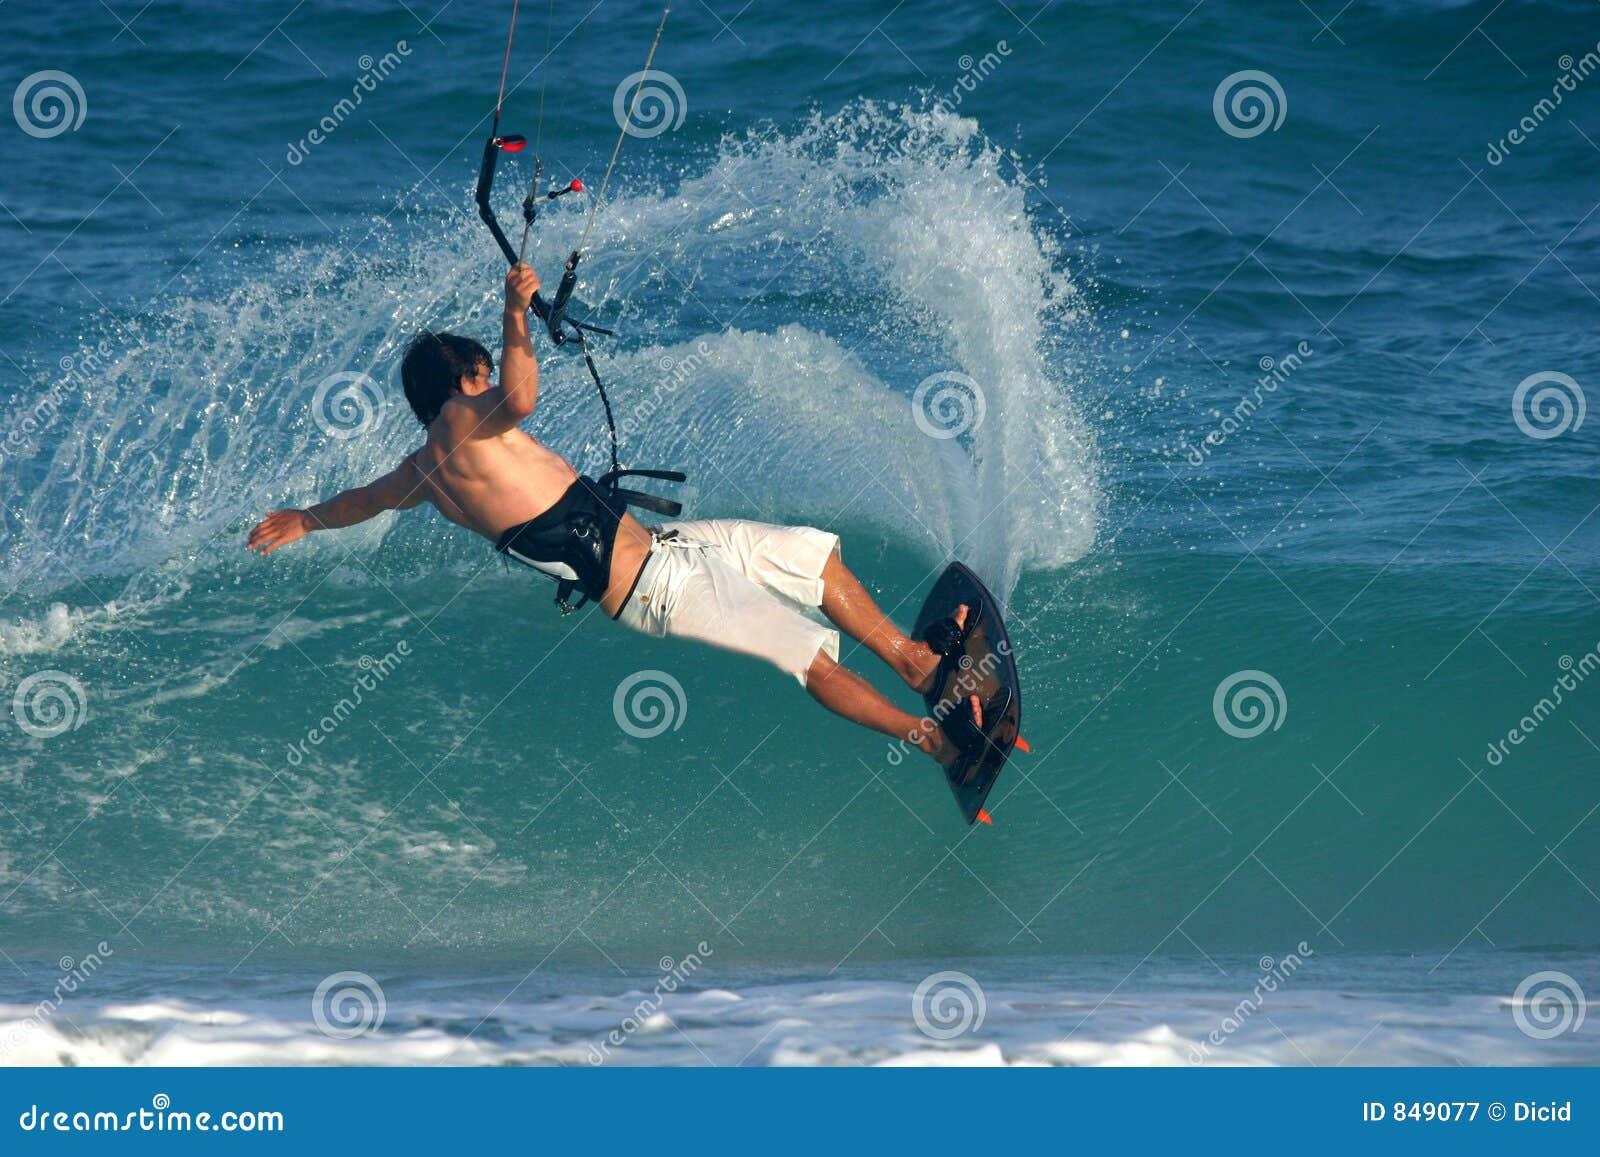 Kite snap 2